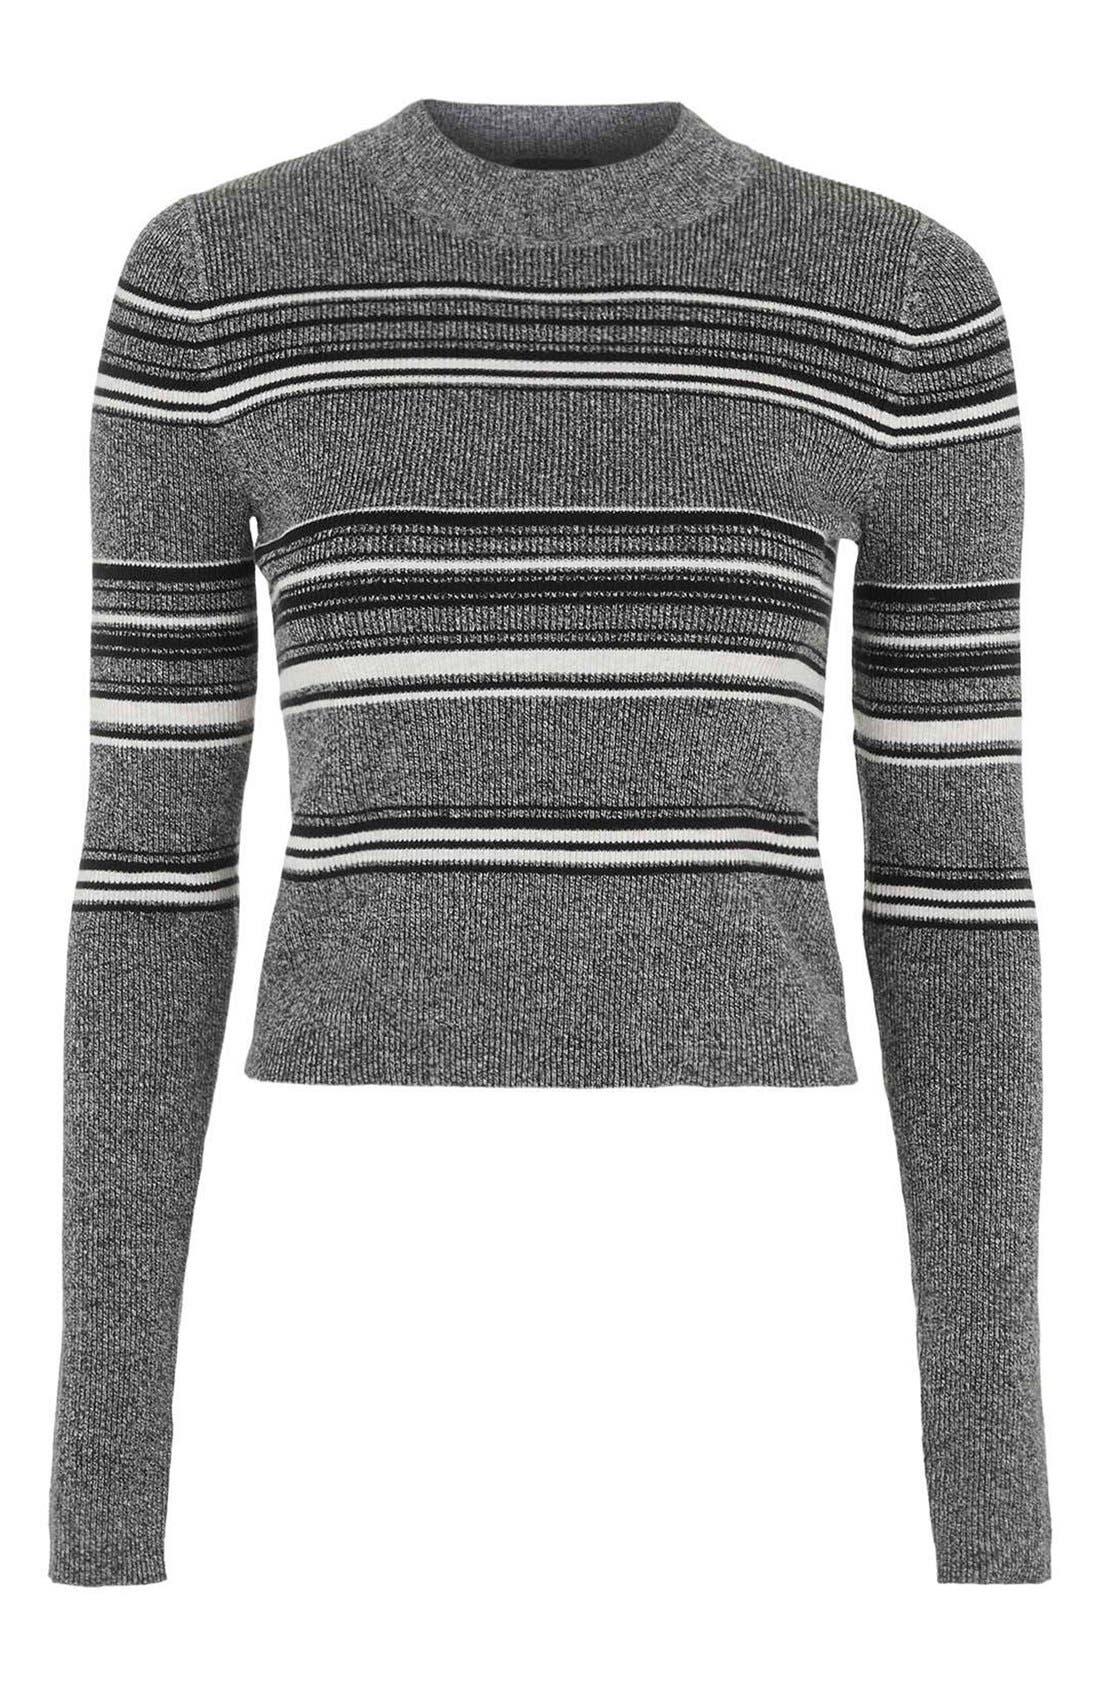 Alternate Image 1 Selected - TopshopStripe Crop Sweater